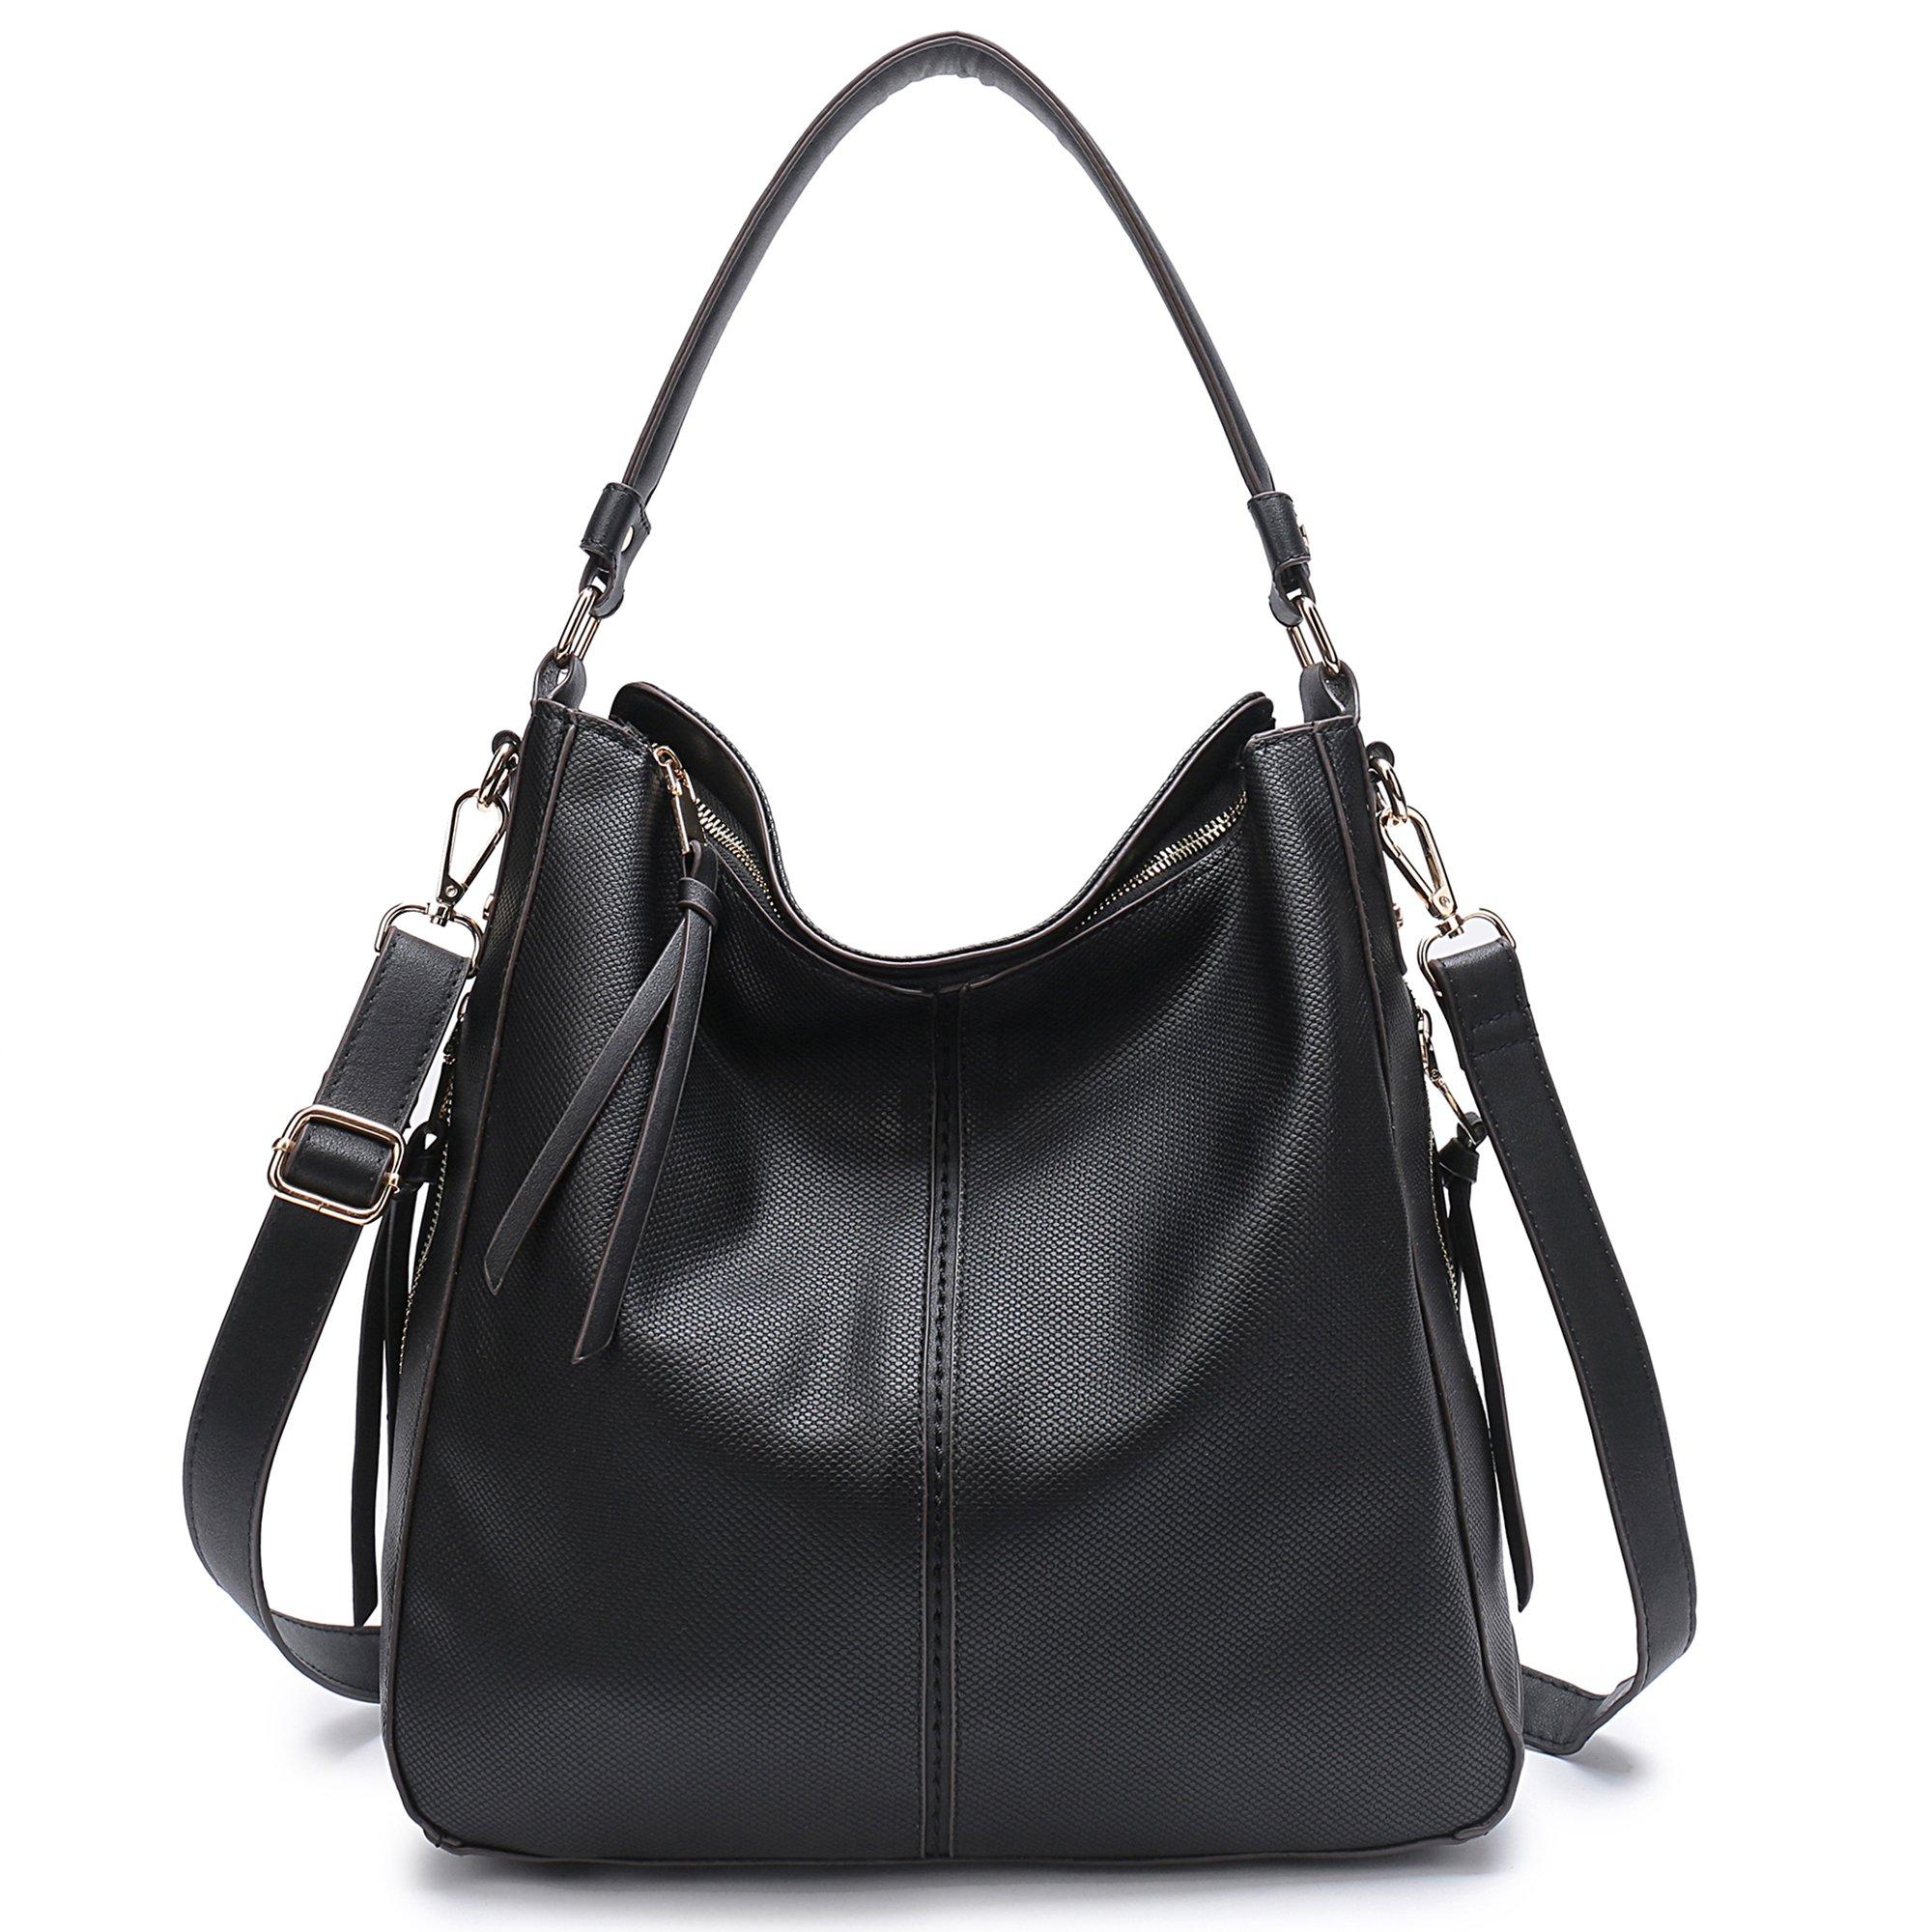 DDDH Vintage Hobo Handbags Shoulder Bags Durable Leather Tote Messenger Bags Bucket Bag For Women/Ladies/Girls (Black-1)